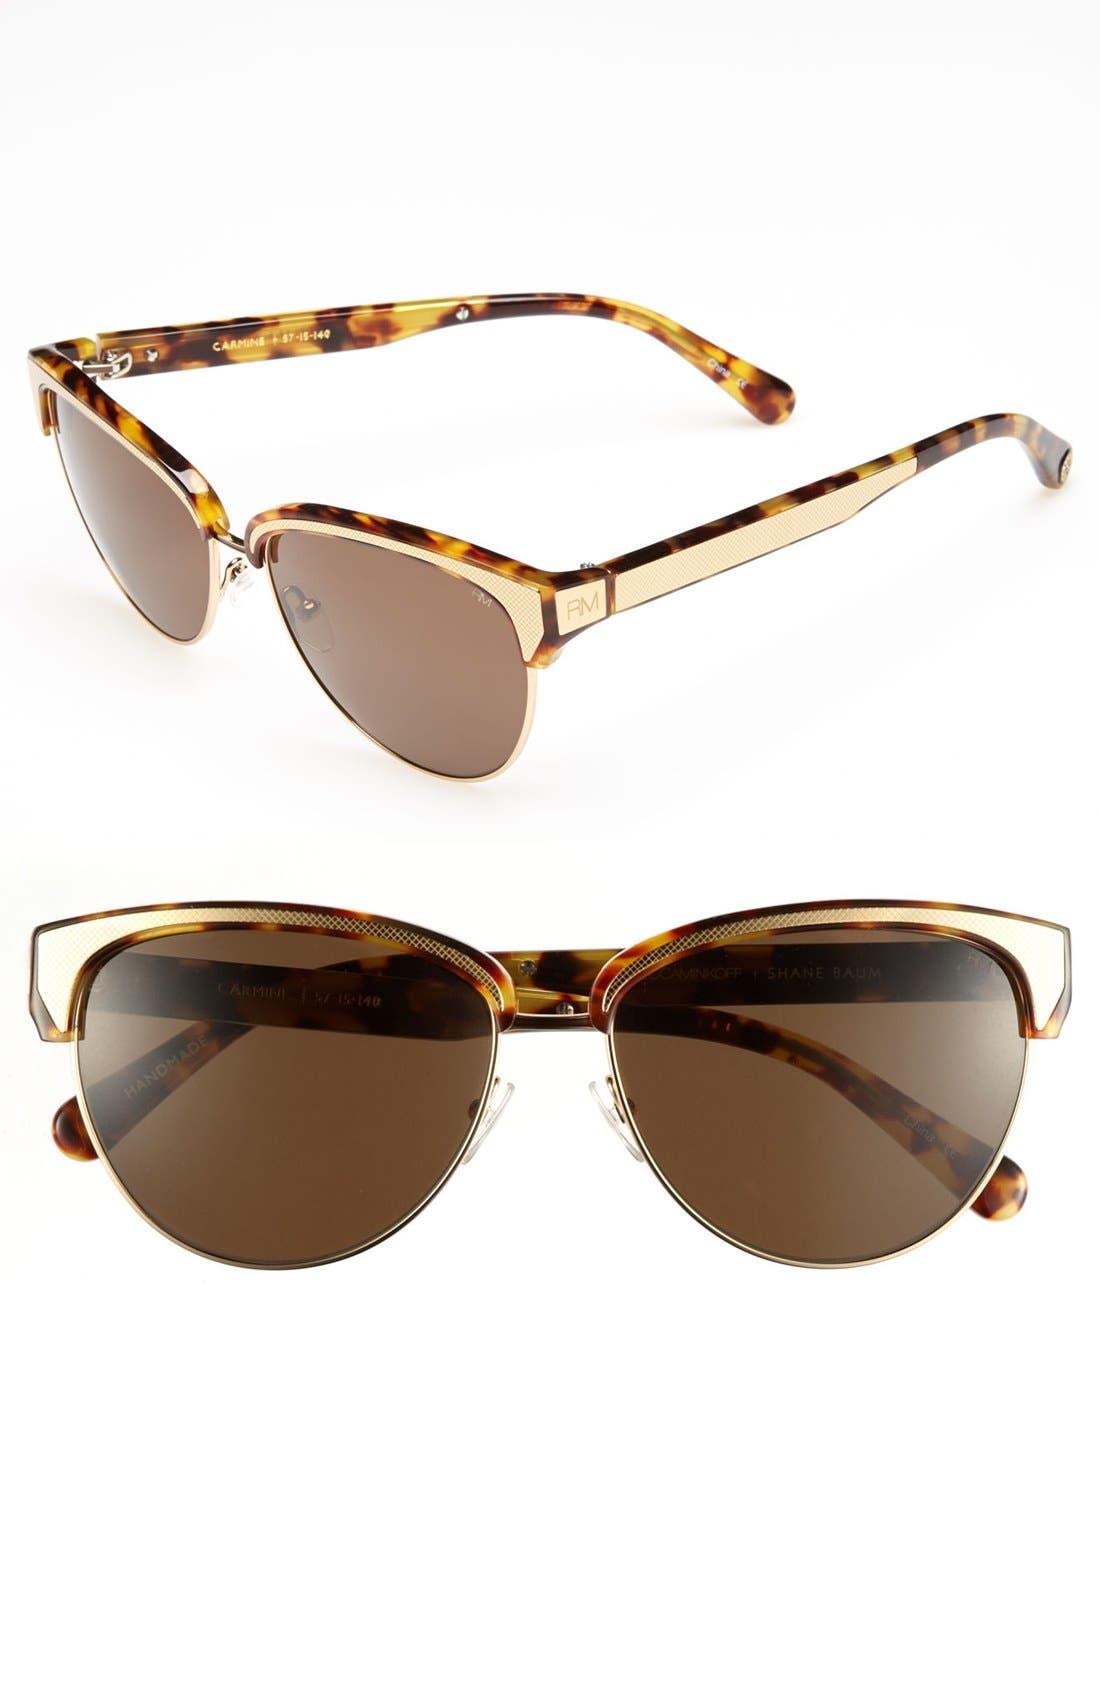 Alternate Image 1 Selected - Rebecca Minkoff 'Carmine' Sunglasses